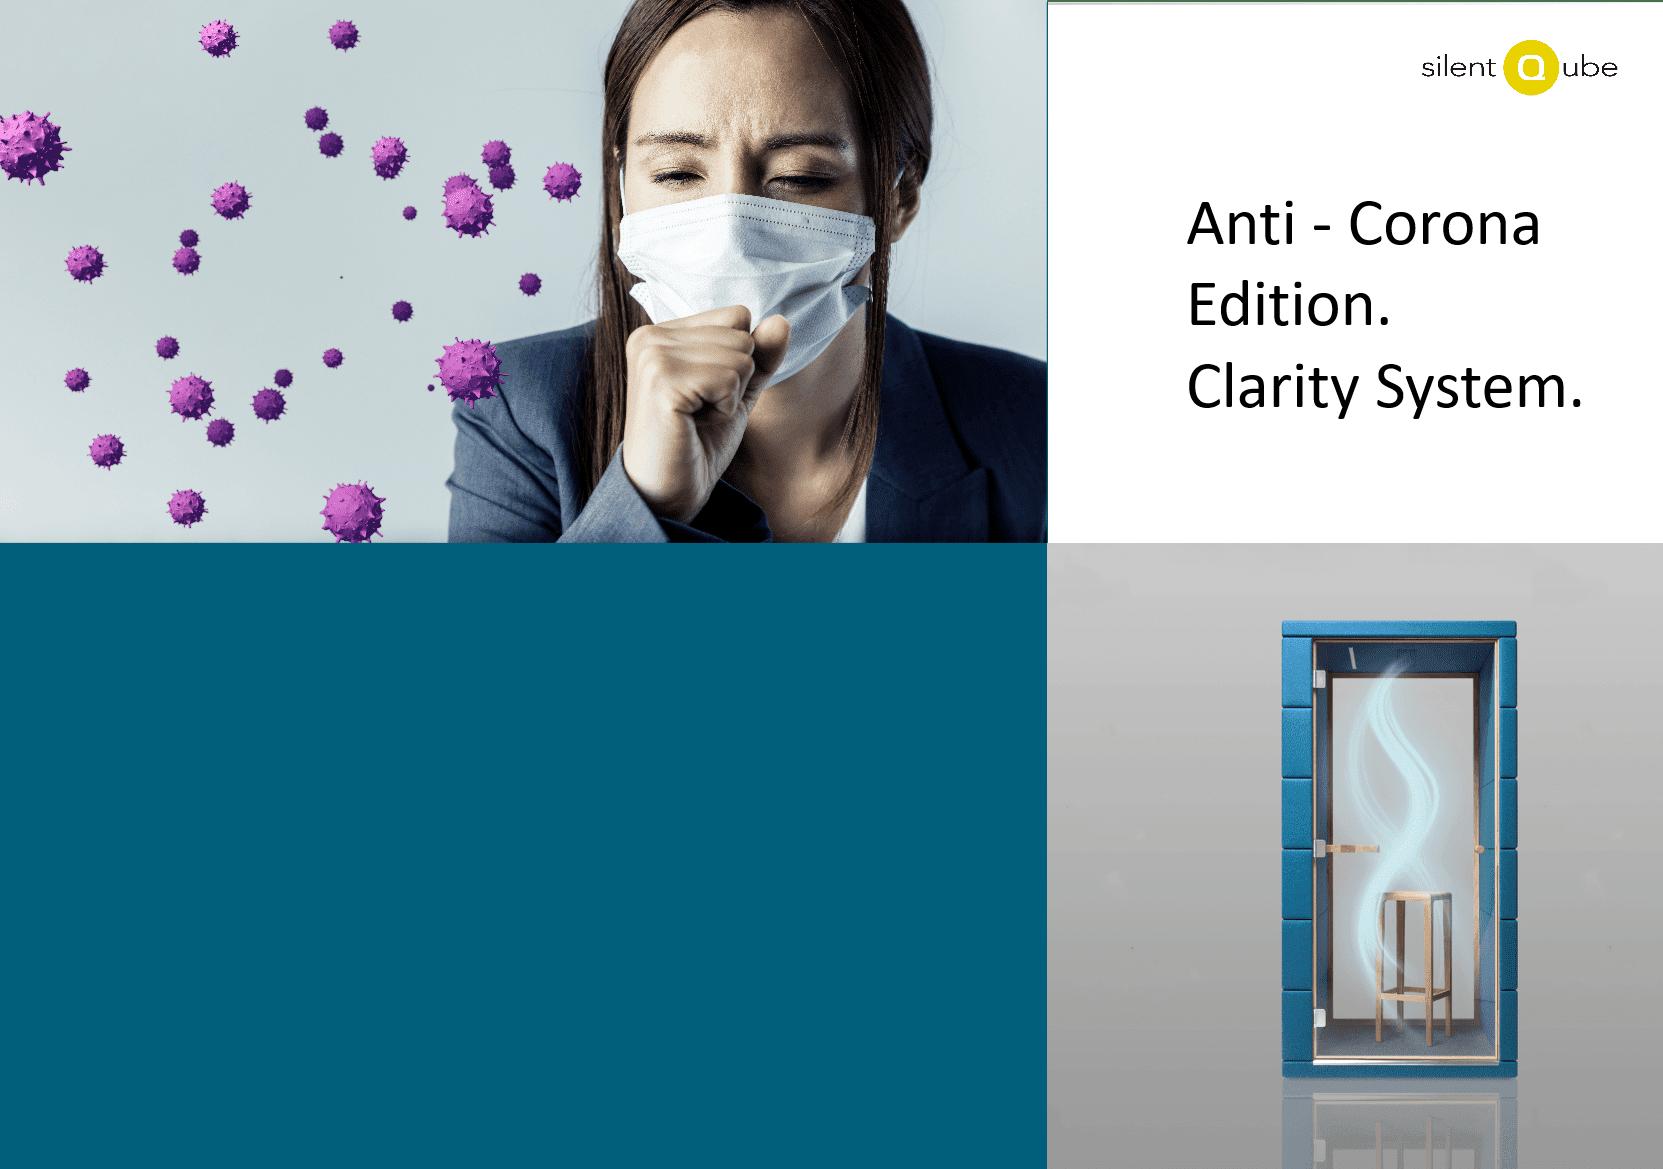 Clarity System-Silent Qube Q1